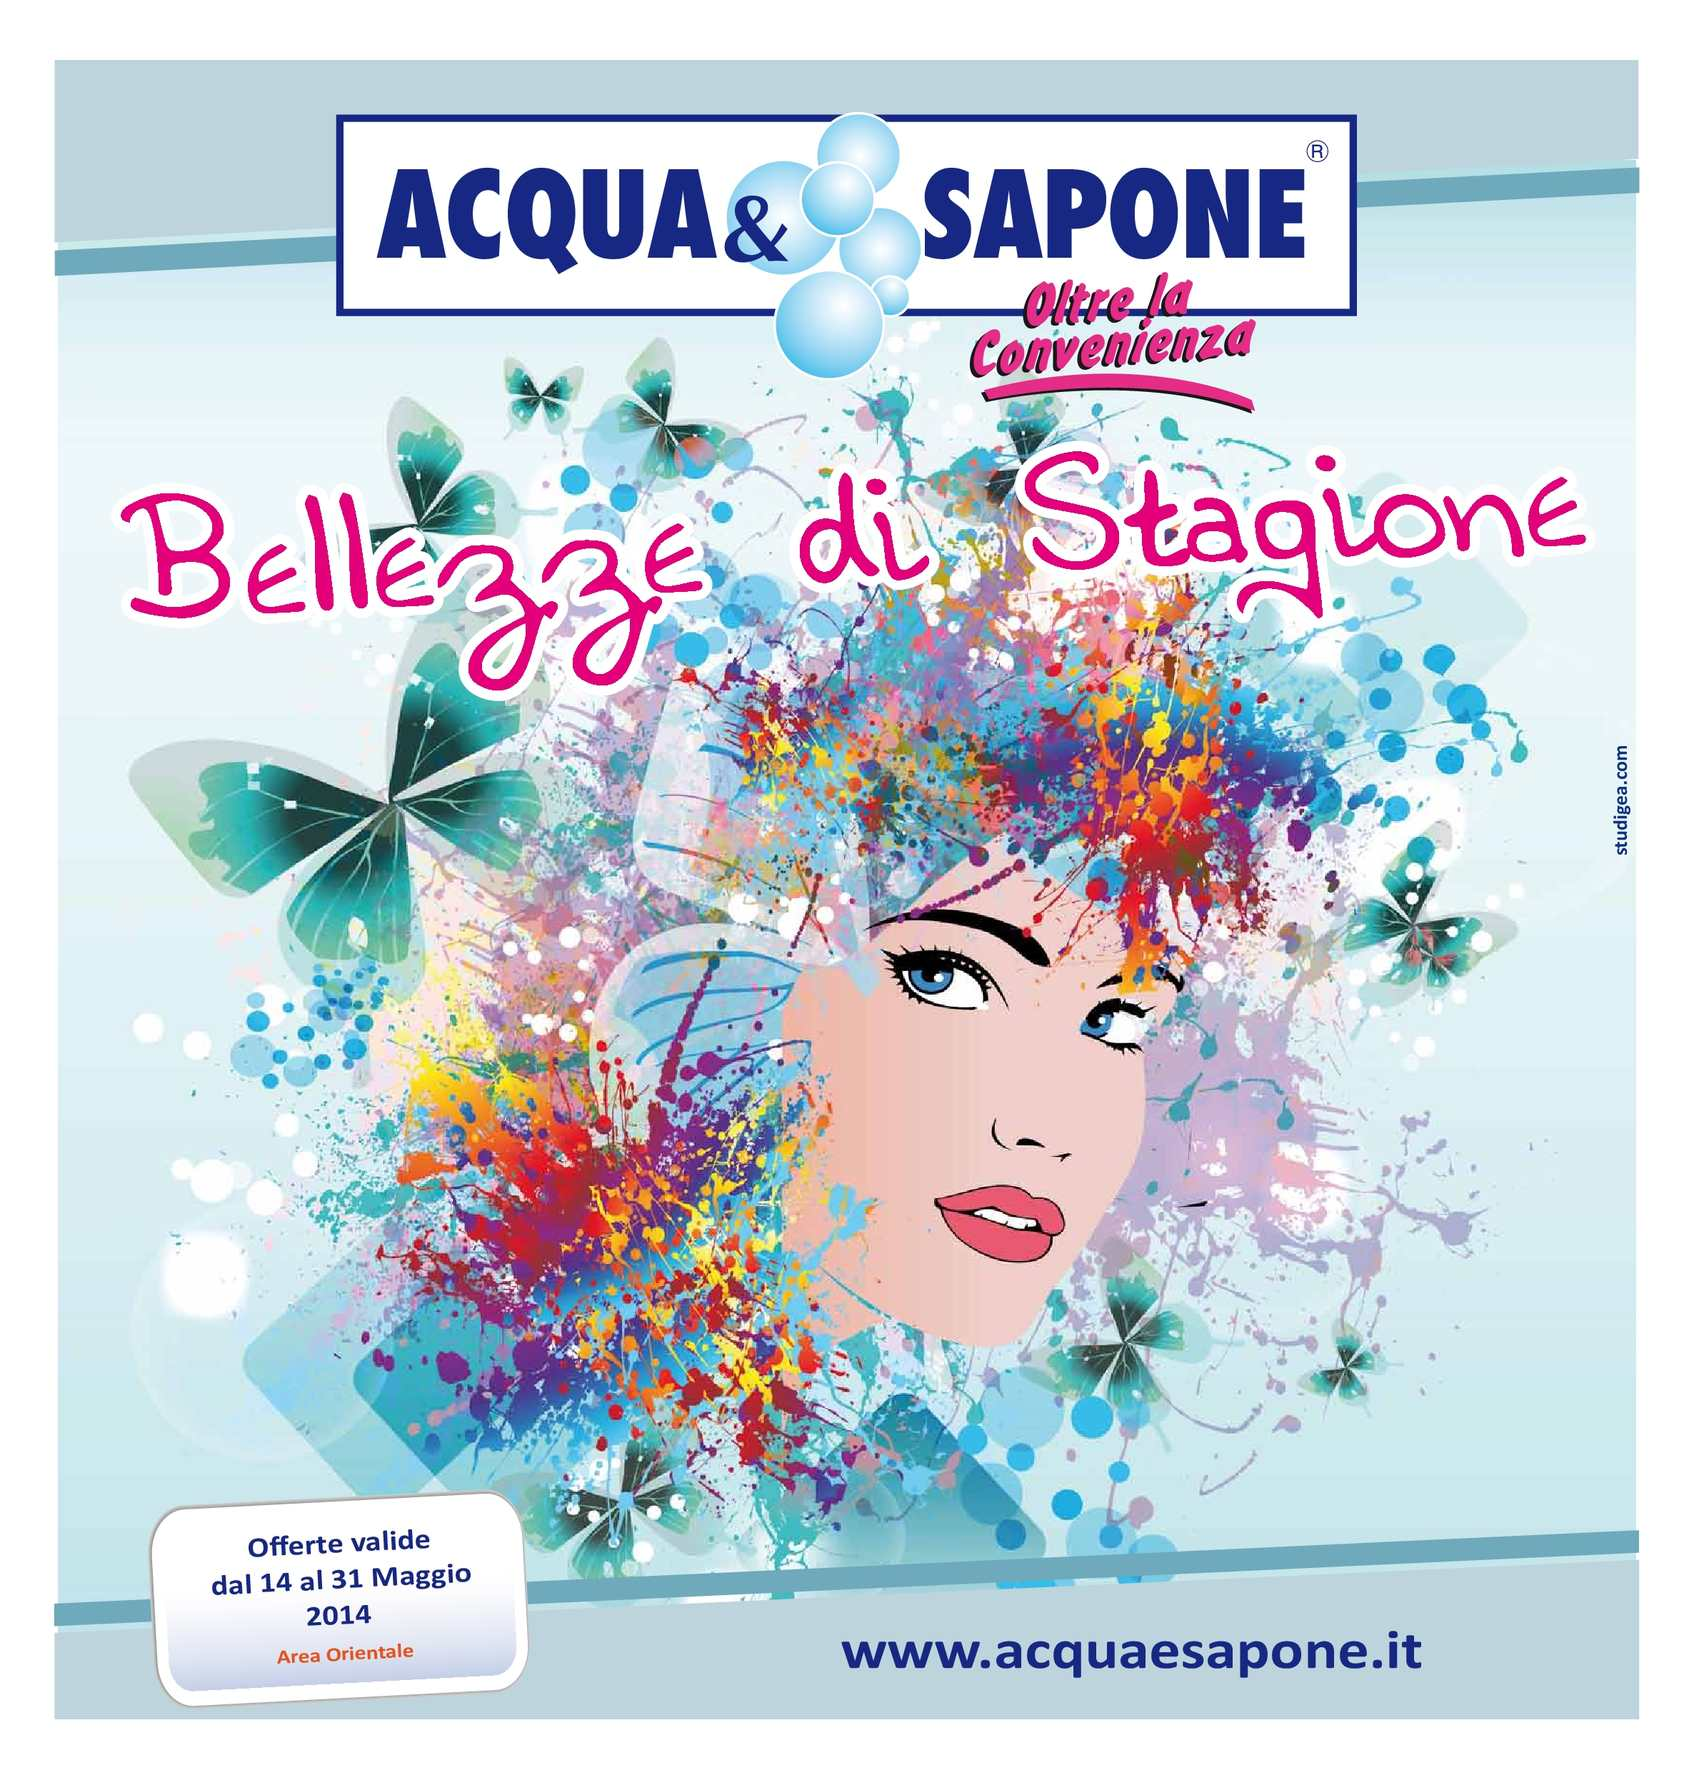 Calam o volantino acqua e sapone sicilia 14 31mag for Volantino acqua e sapone sicilia